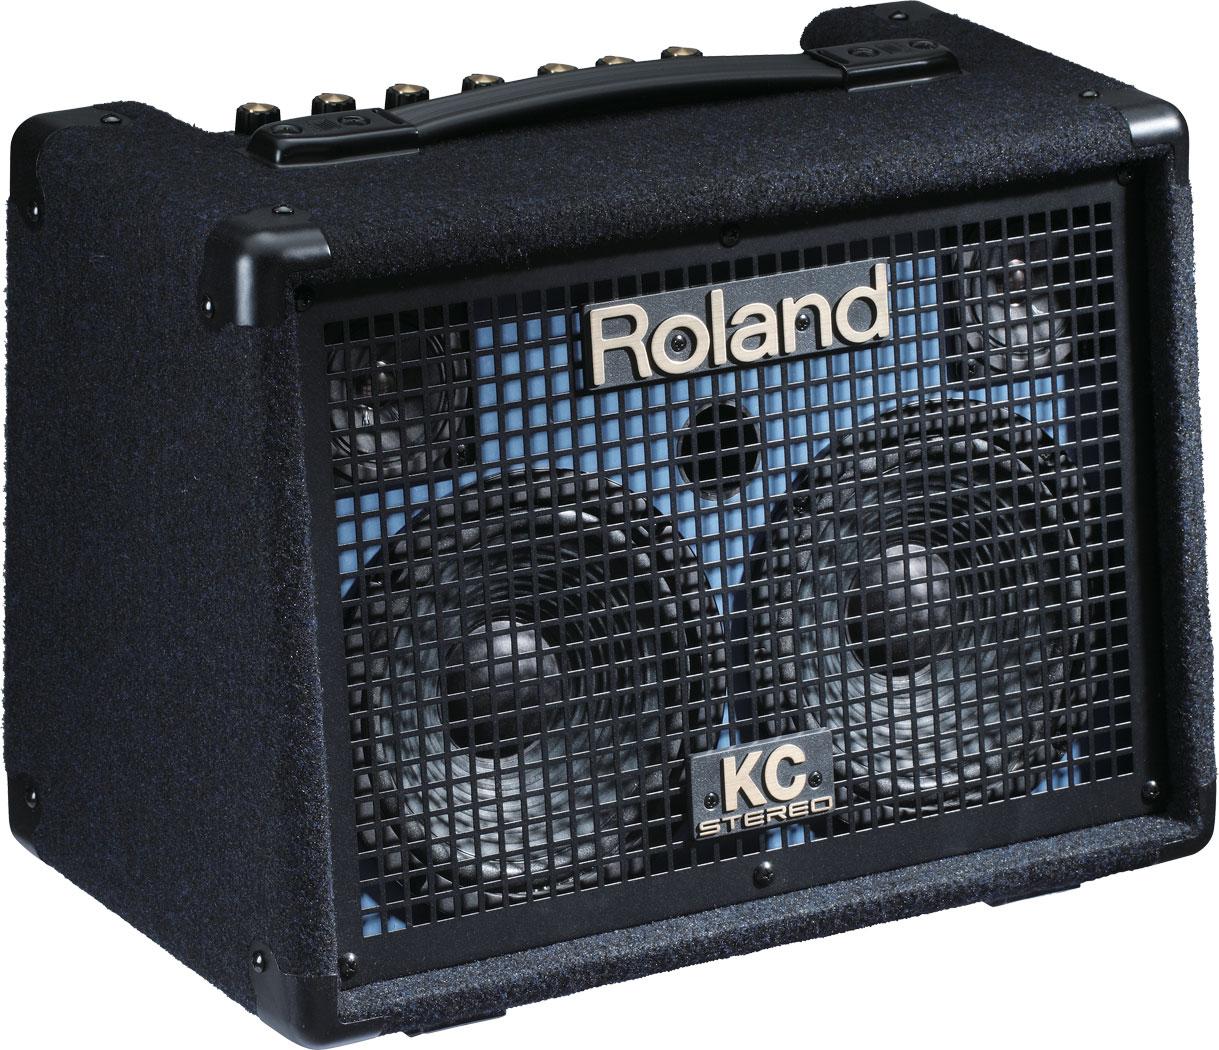 Roland Kc 110 Stereo Keyboard Amplifier